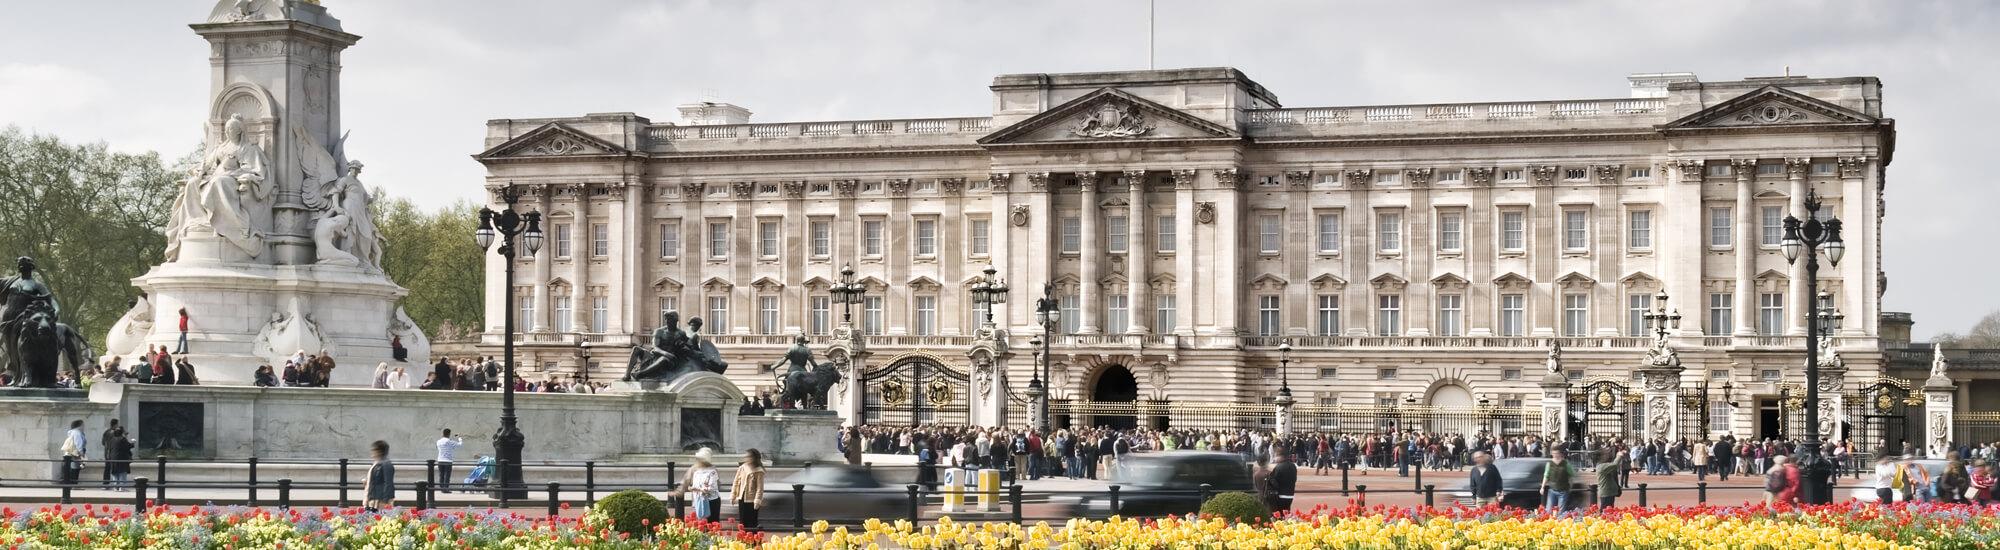 Buckingham Palace London Tour